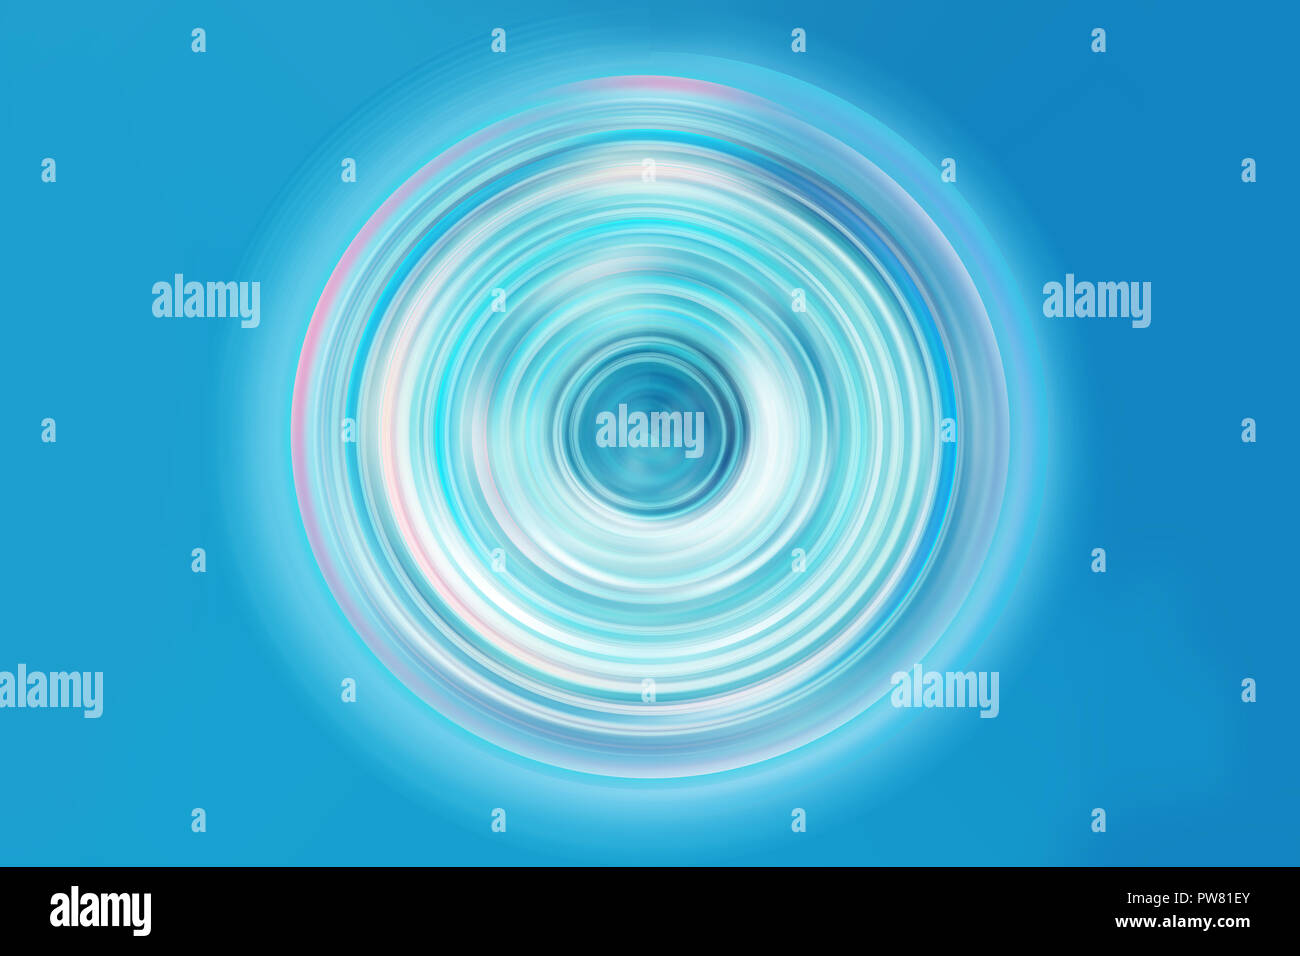 high tech digital spin button futuristic technology blue color